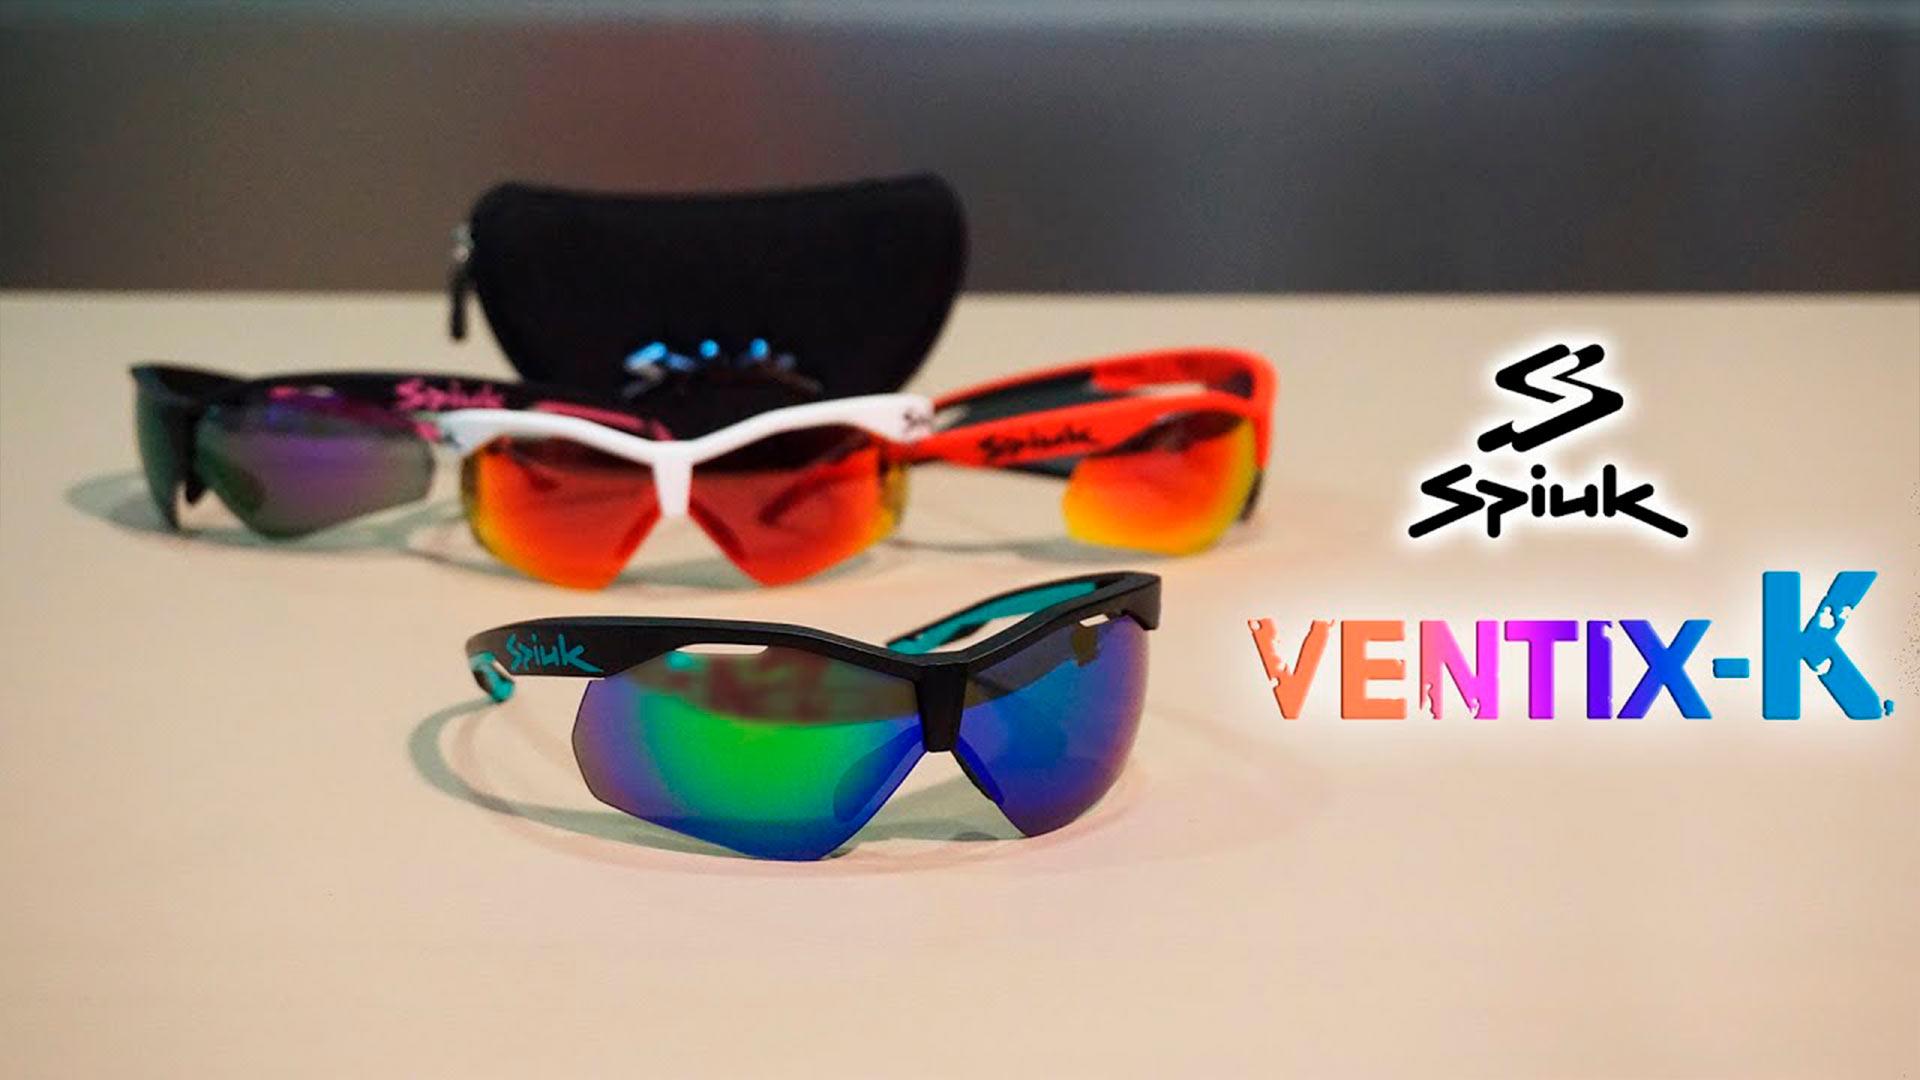 Spiux Ventix-K, ¡mejora tu experiencia visual!